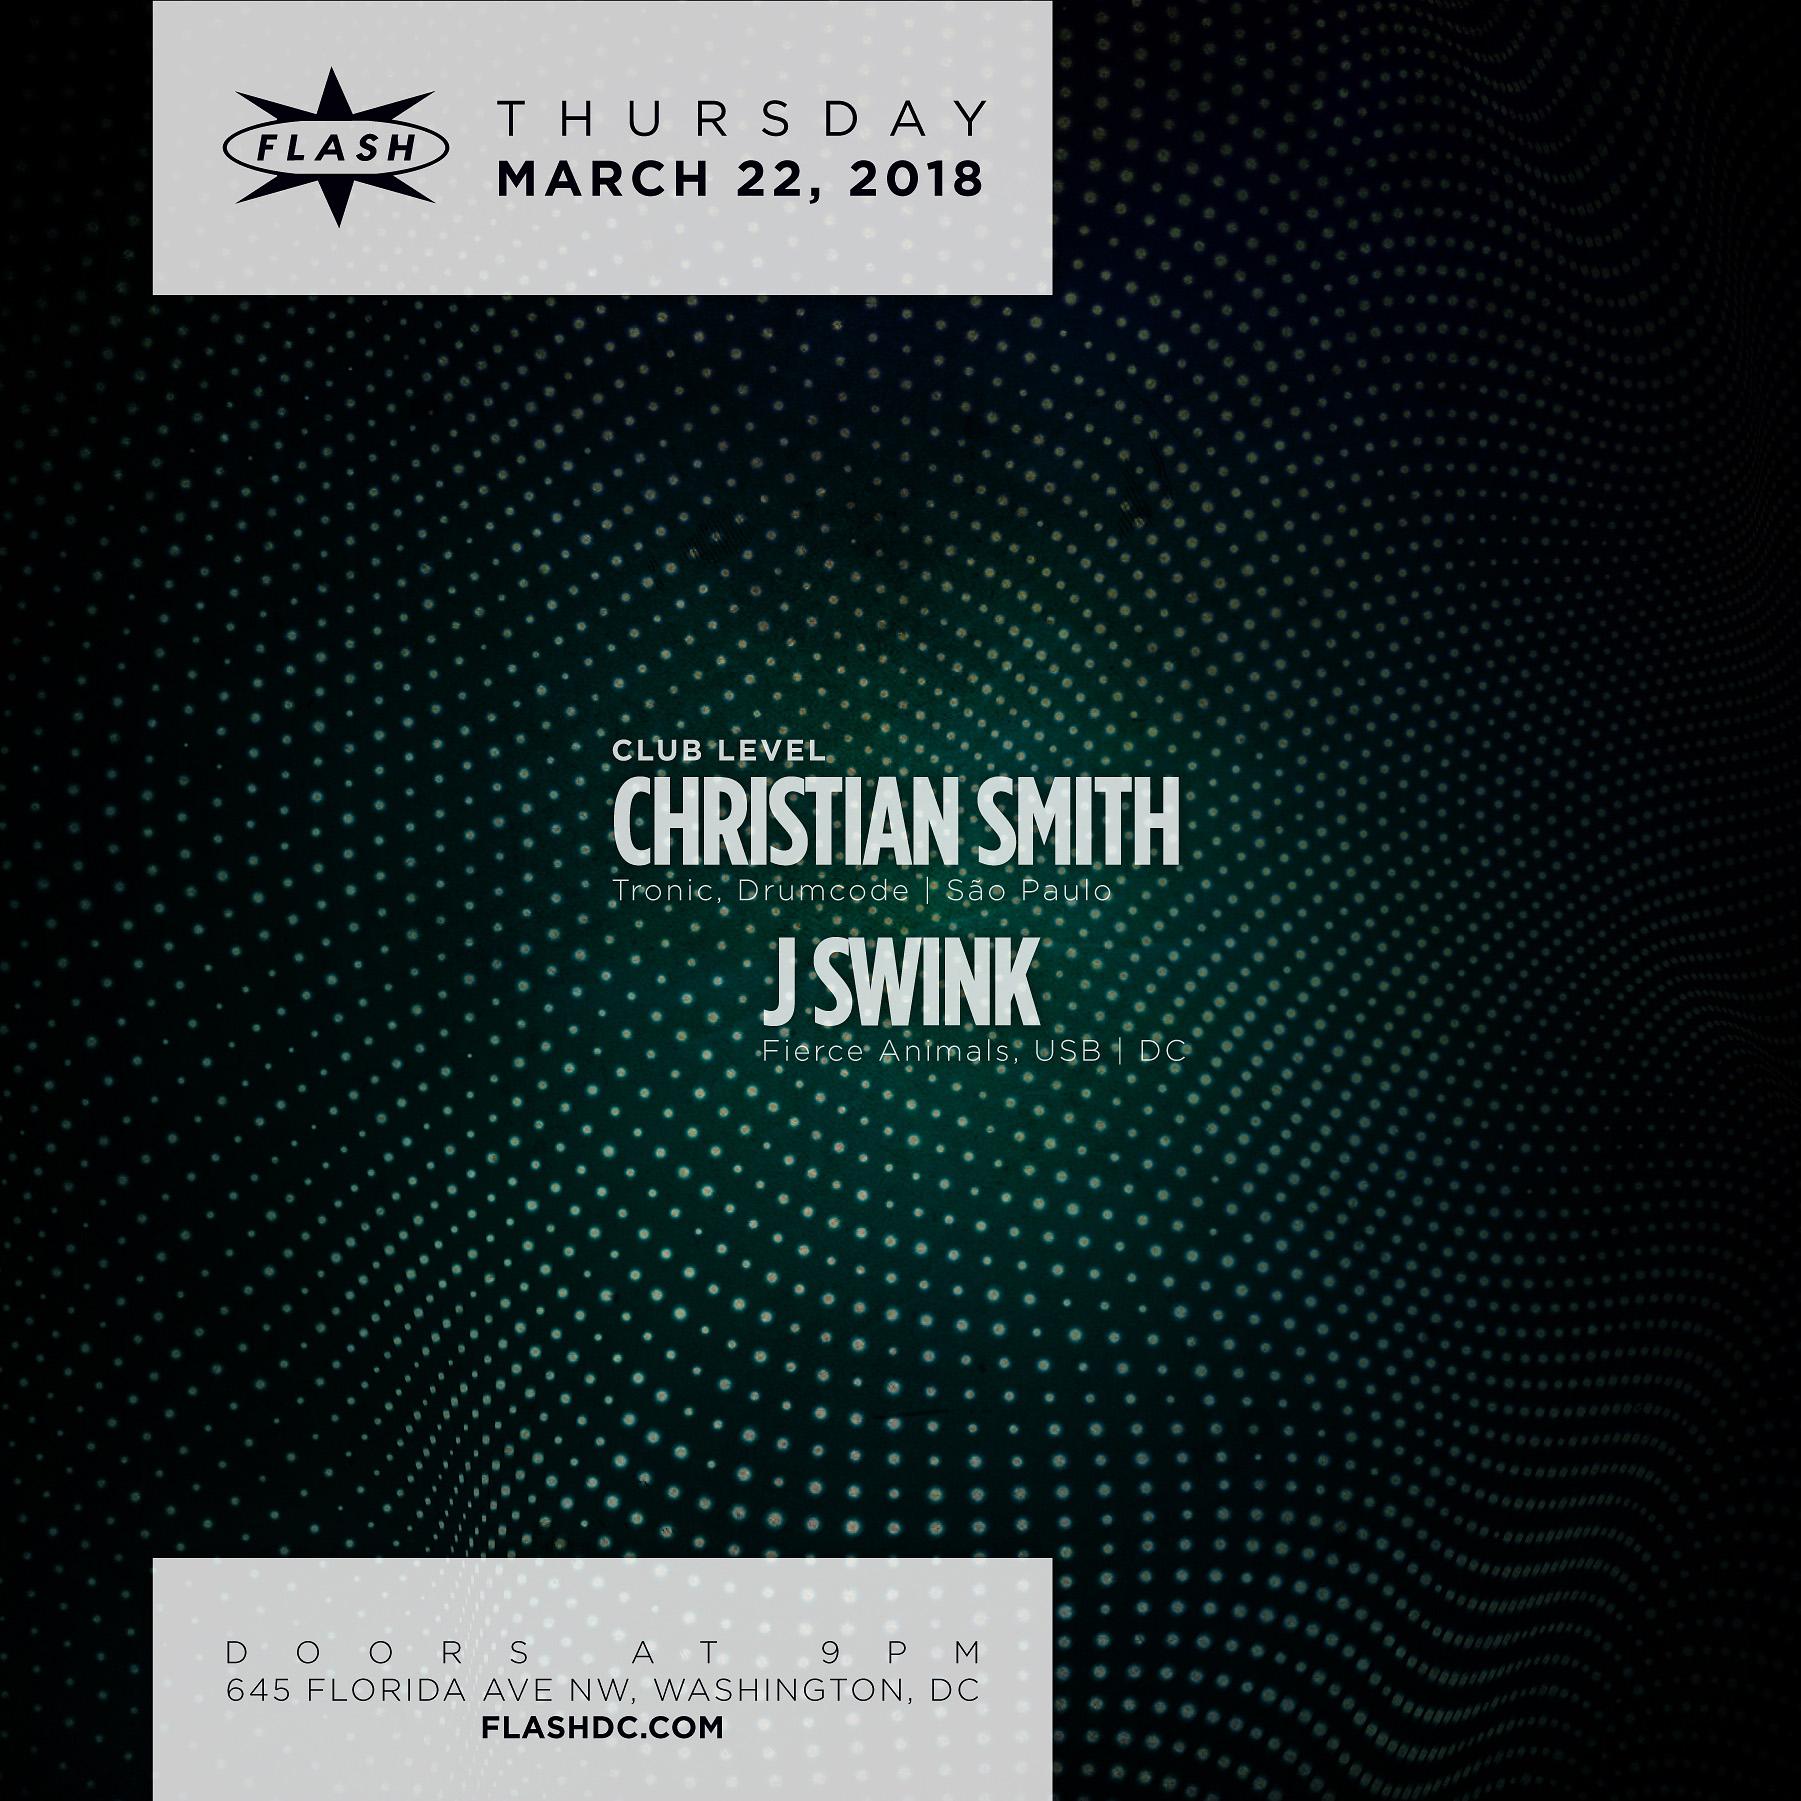 Christian Smith event thumbnail